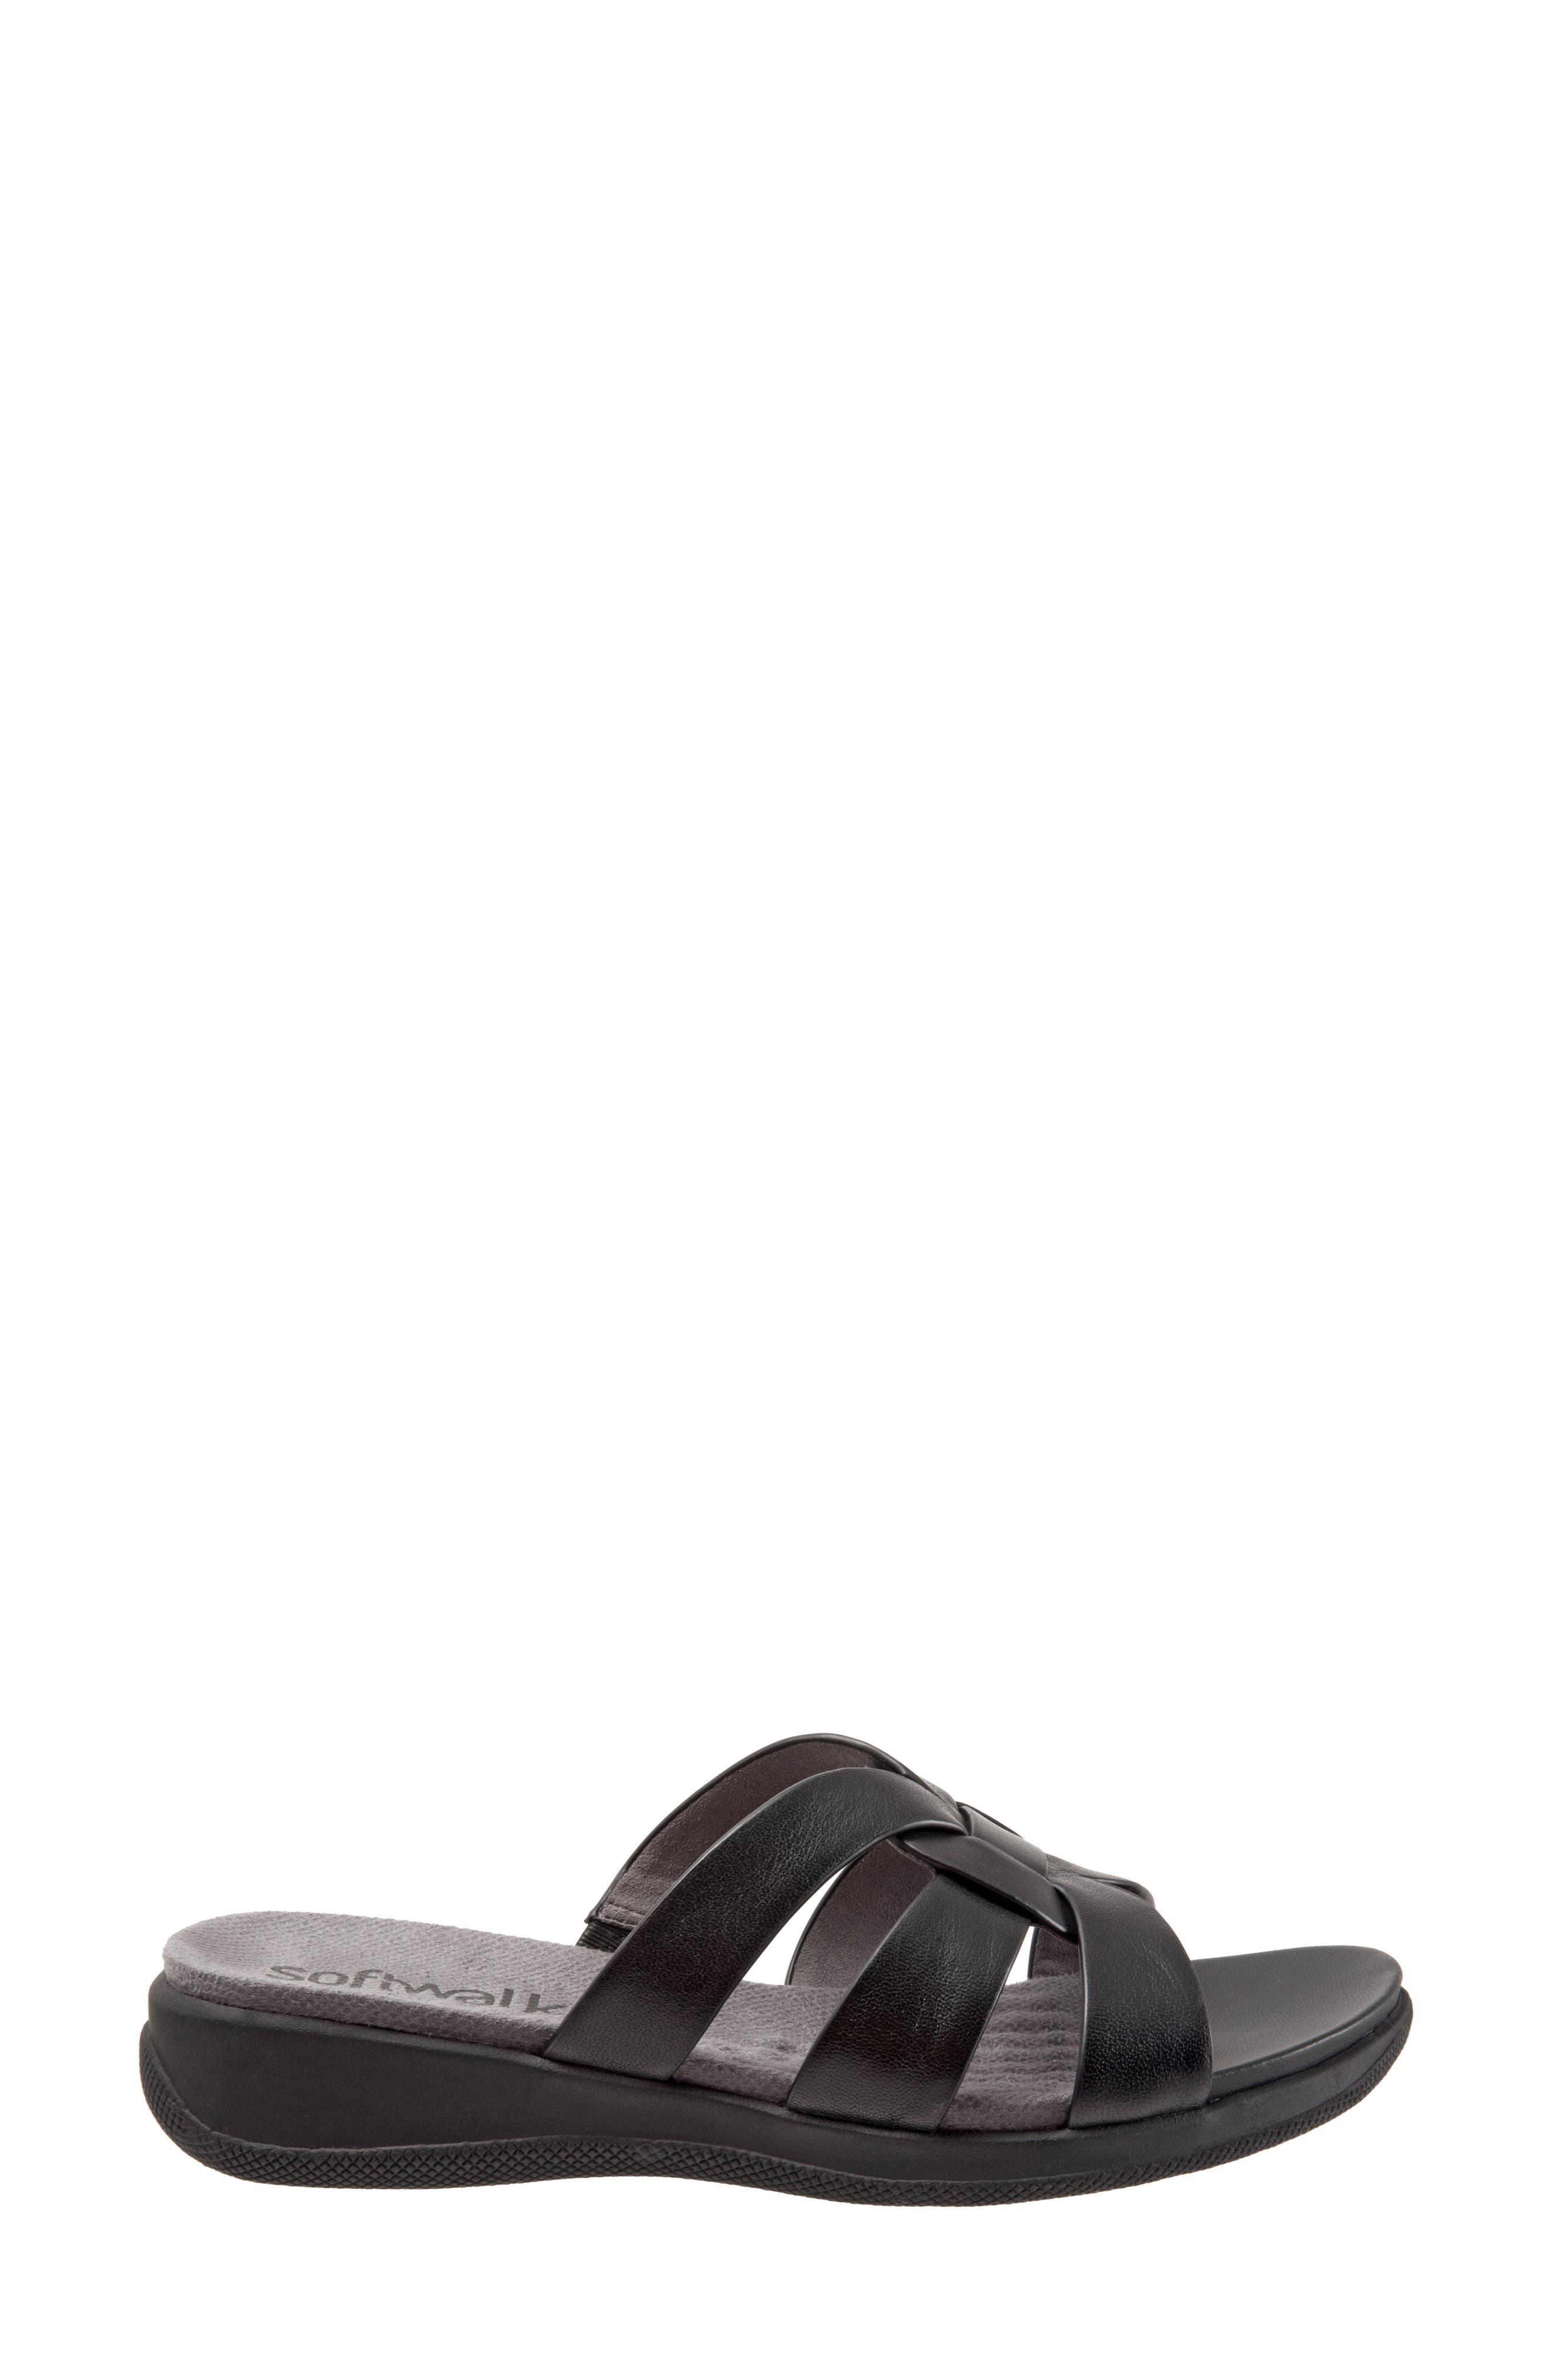 Thompson Slide Sandal,                             Alternate thumbnail 3, color,                             Black Leather